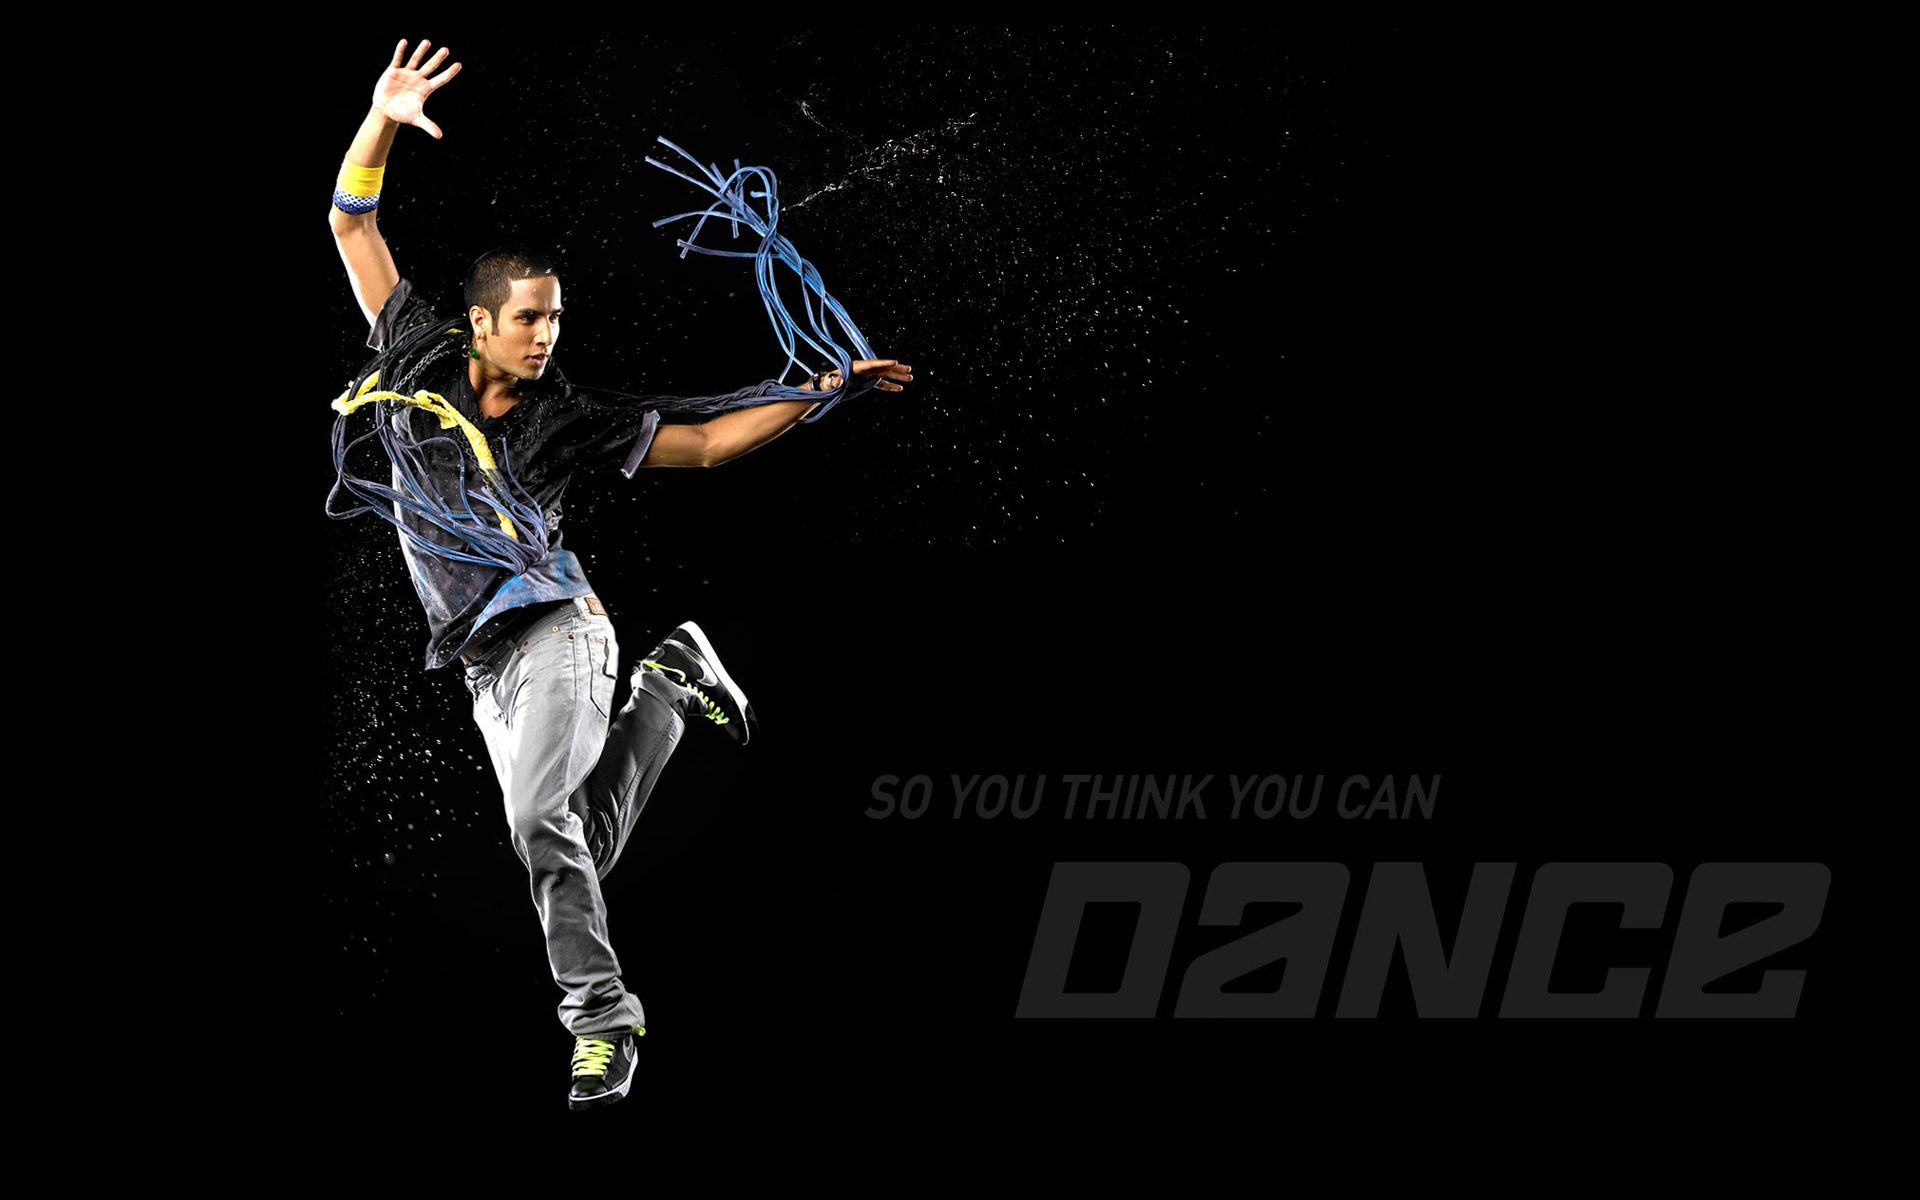 Free Download Dance Hd Wallpaper Dance Pictures Dance Wallpaper Dance Background